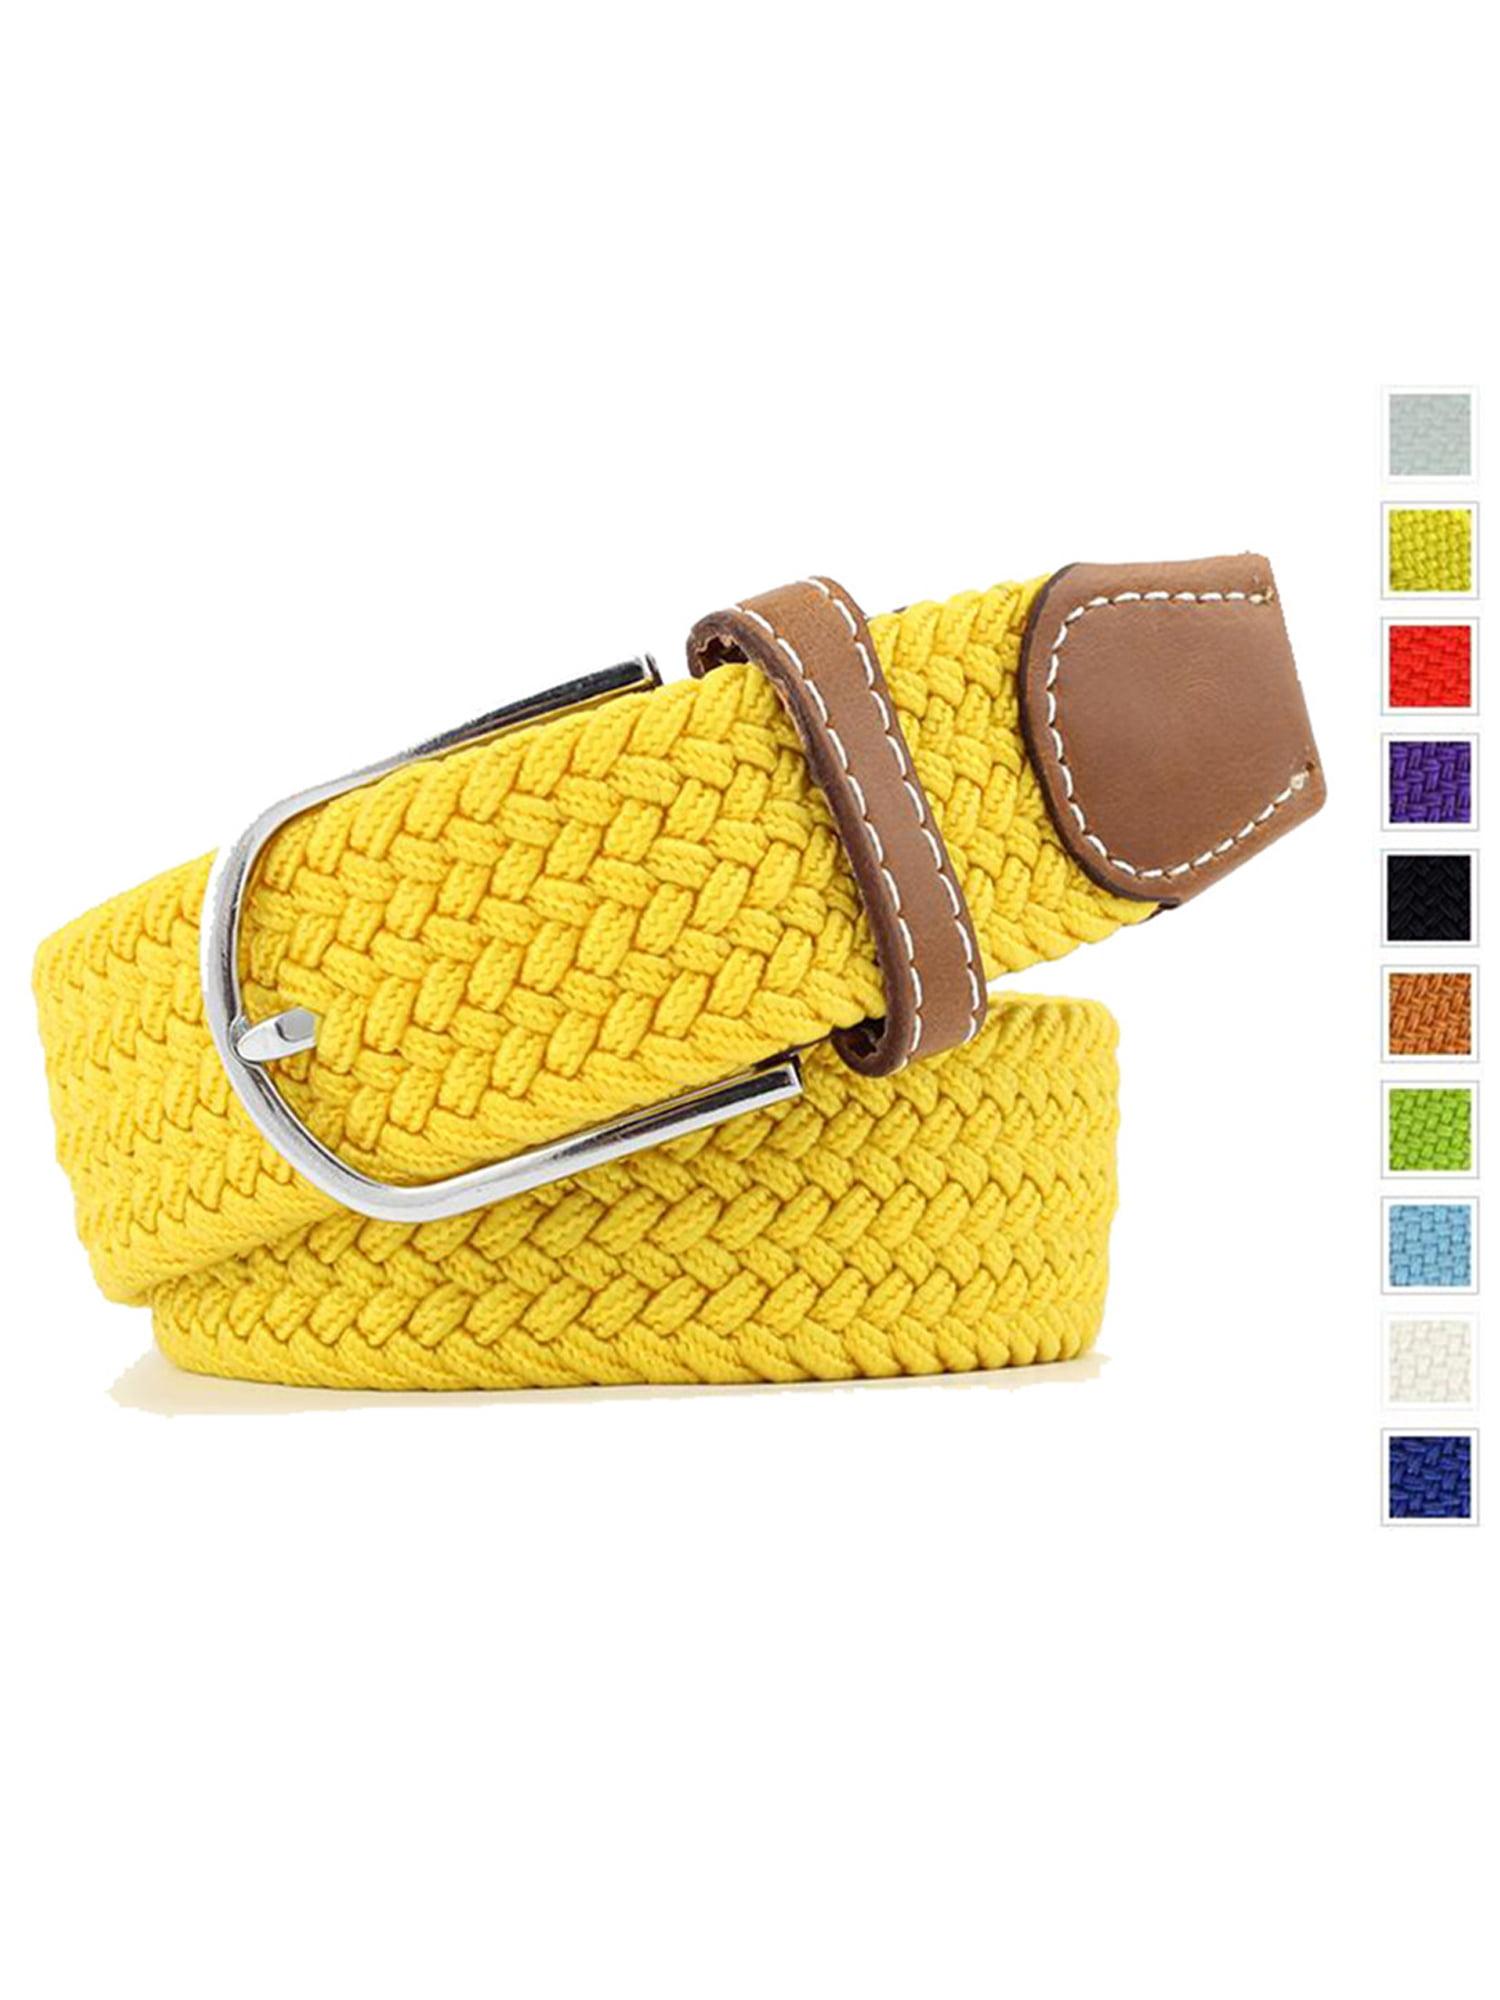 Men's Braided Stretch Belts PU Leather Elastic Fabric Woven Webbing Belt Yellow